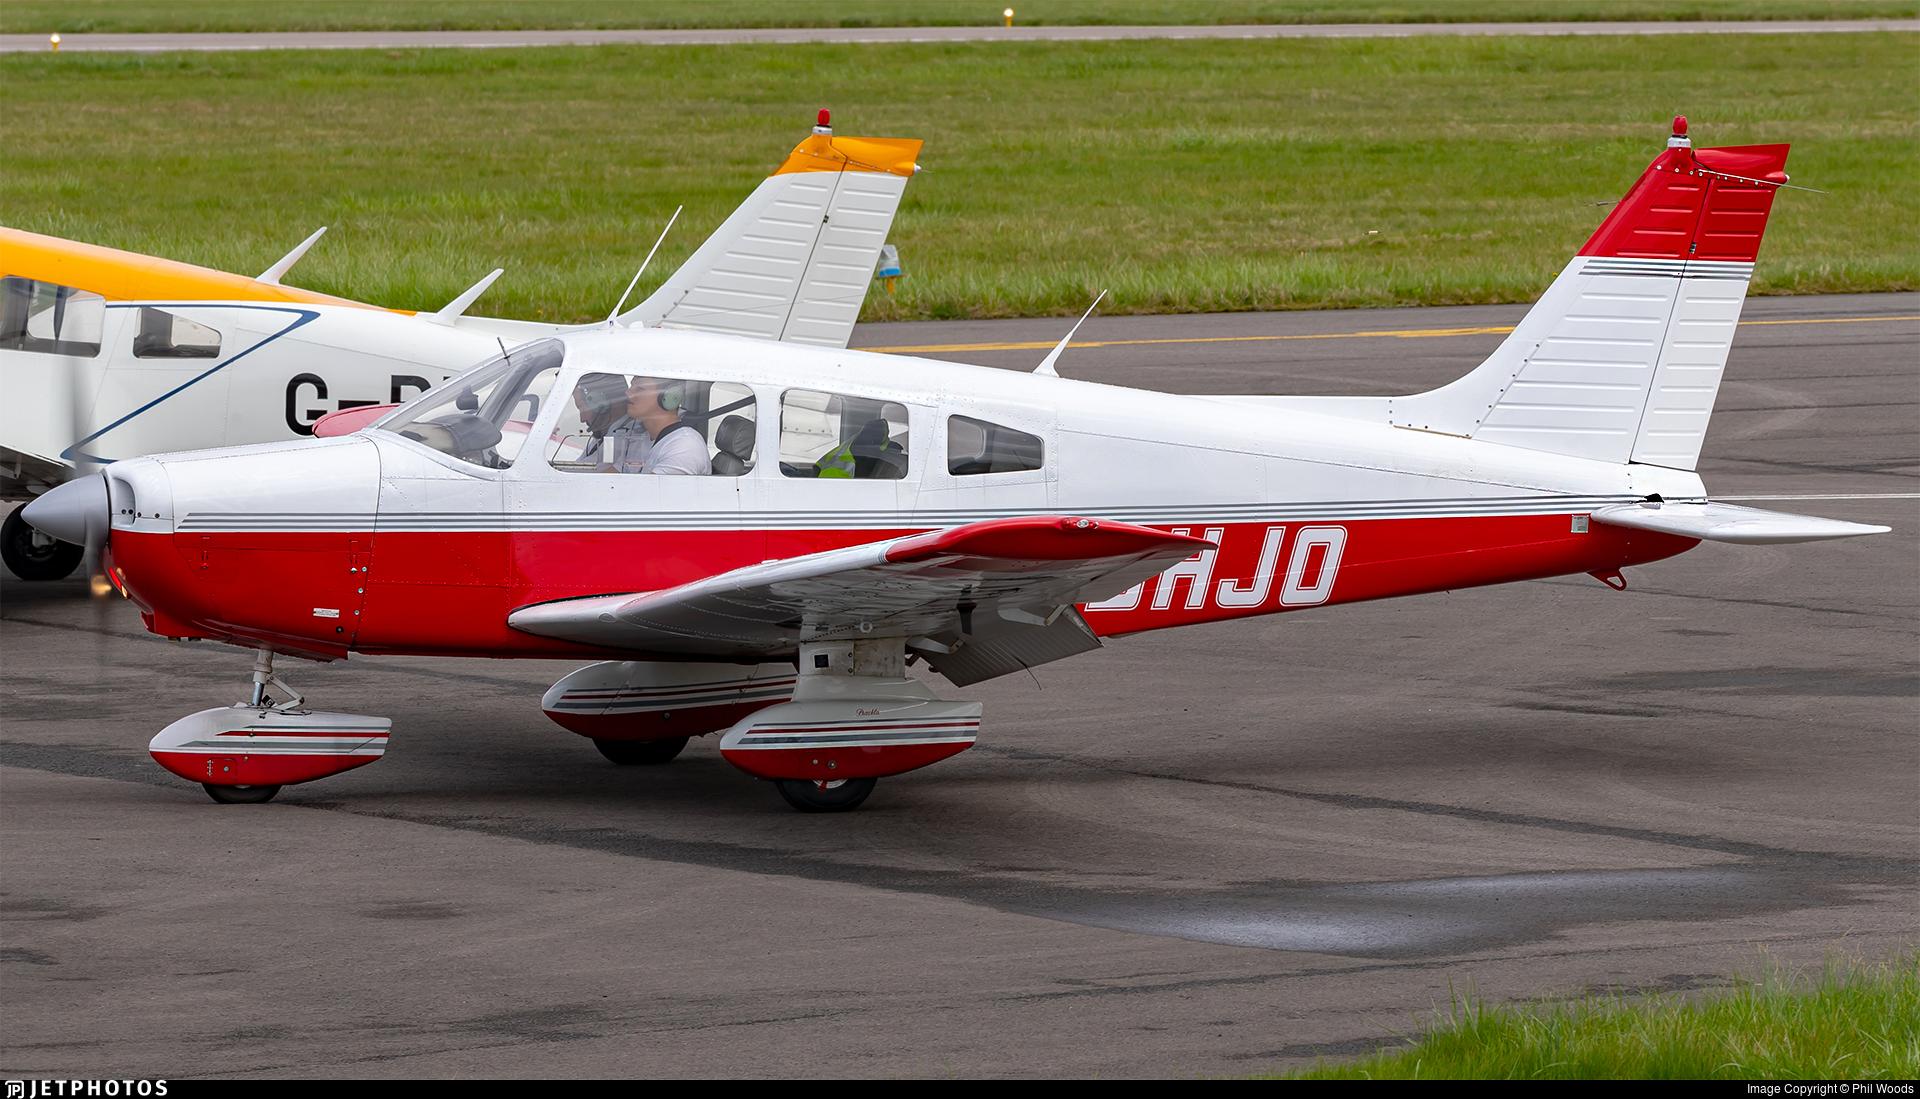 G-BHJO - Piper PA-28-161 Cherokee Warrior II - Private